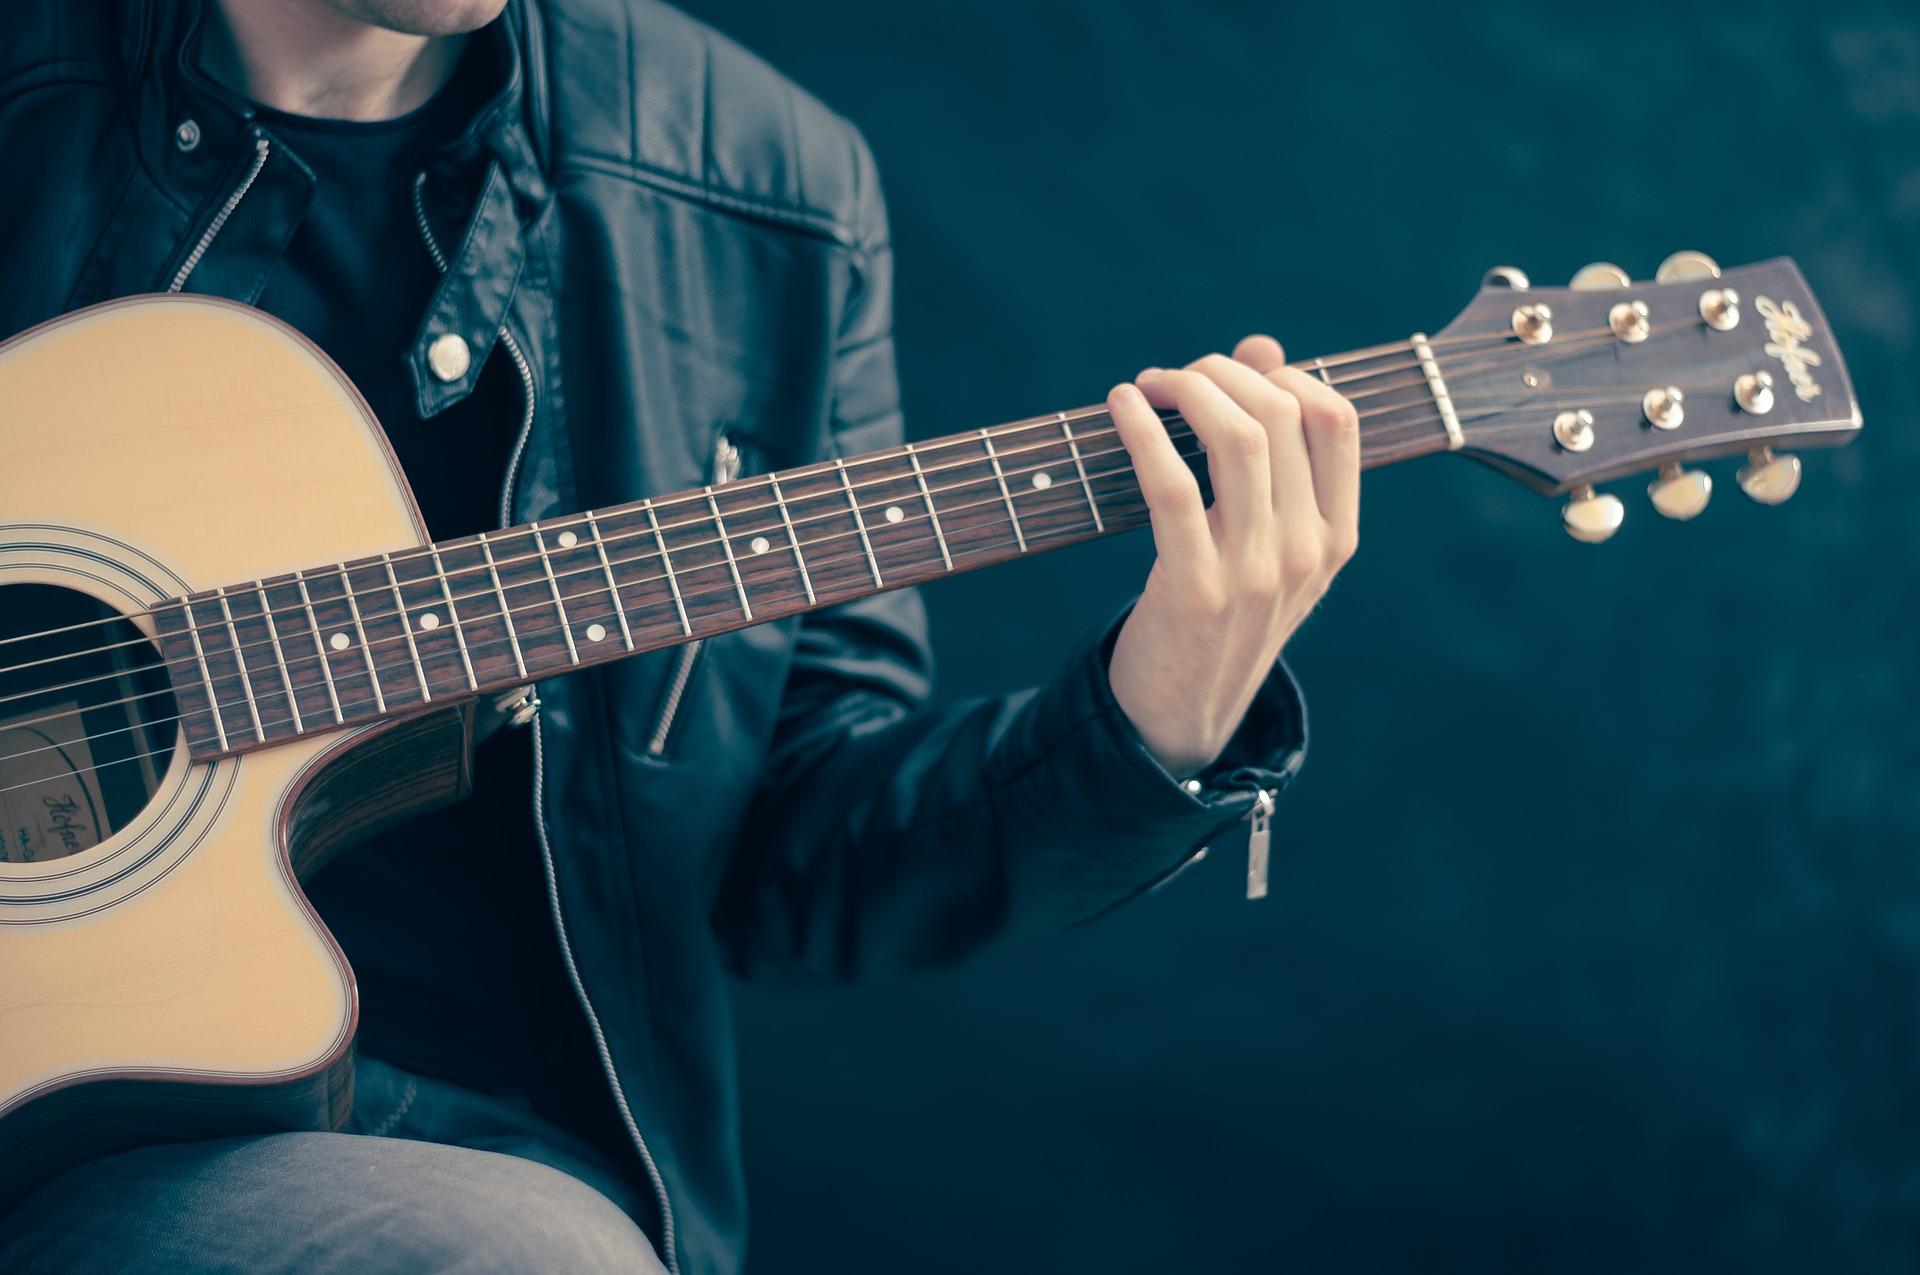 guitar-756326_1920_1557880638732.jpg